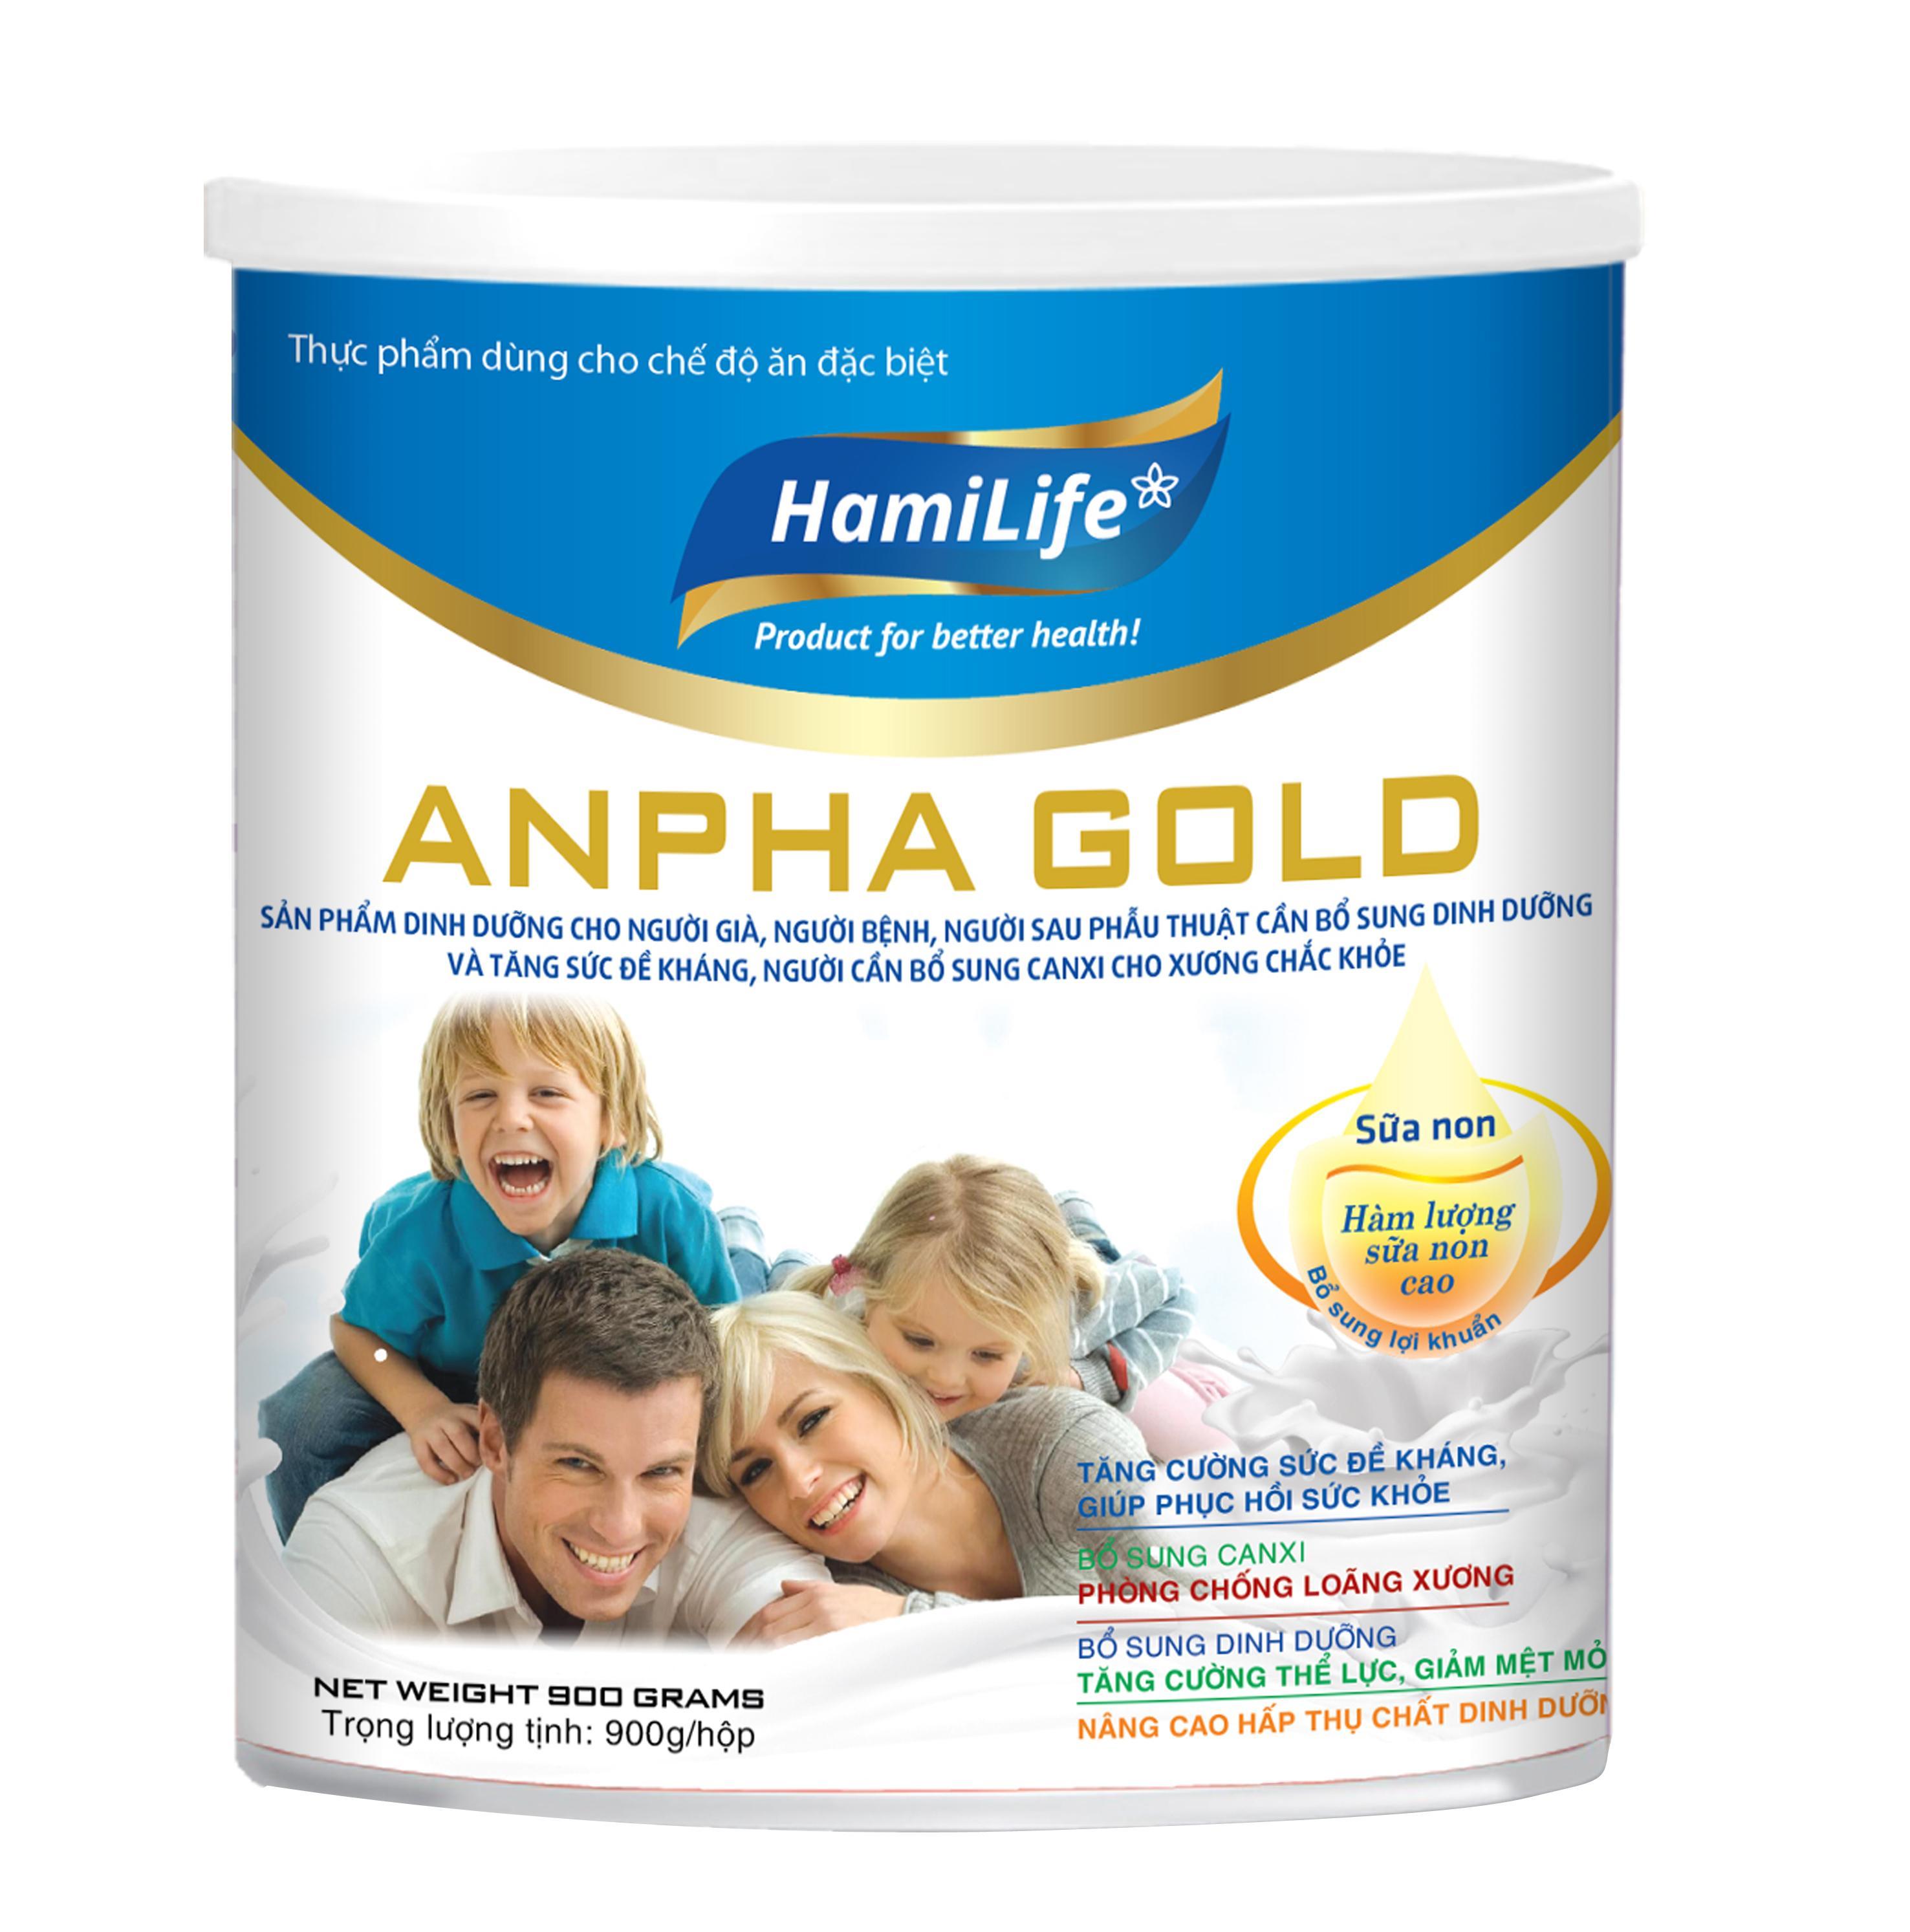 HAMILIFE ANPHA GOLD 900g